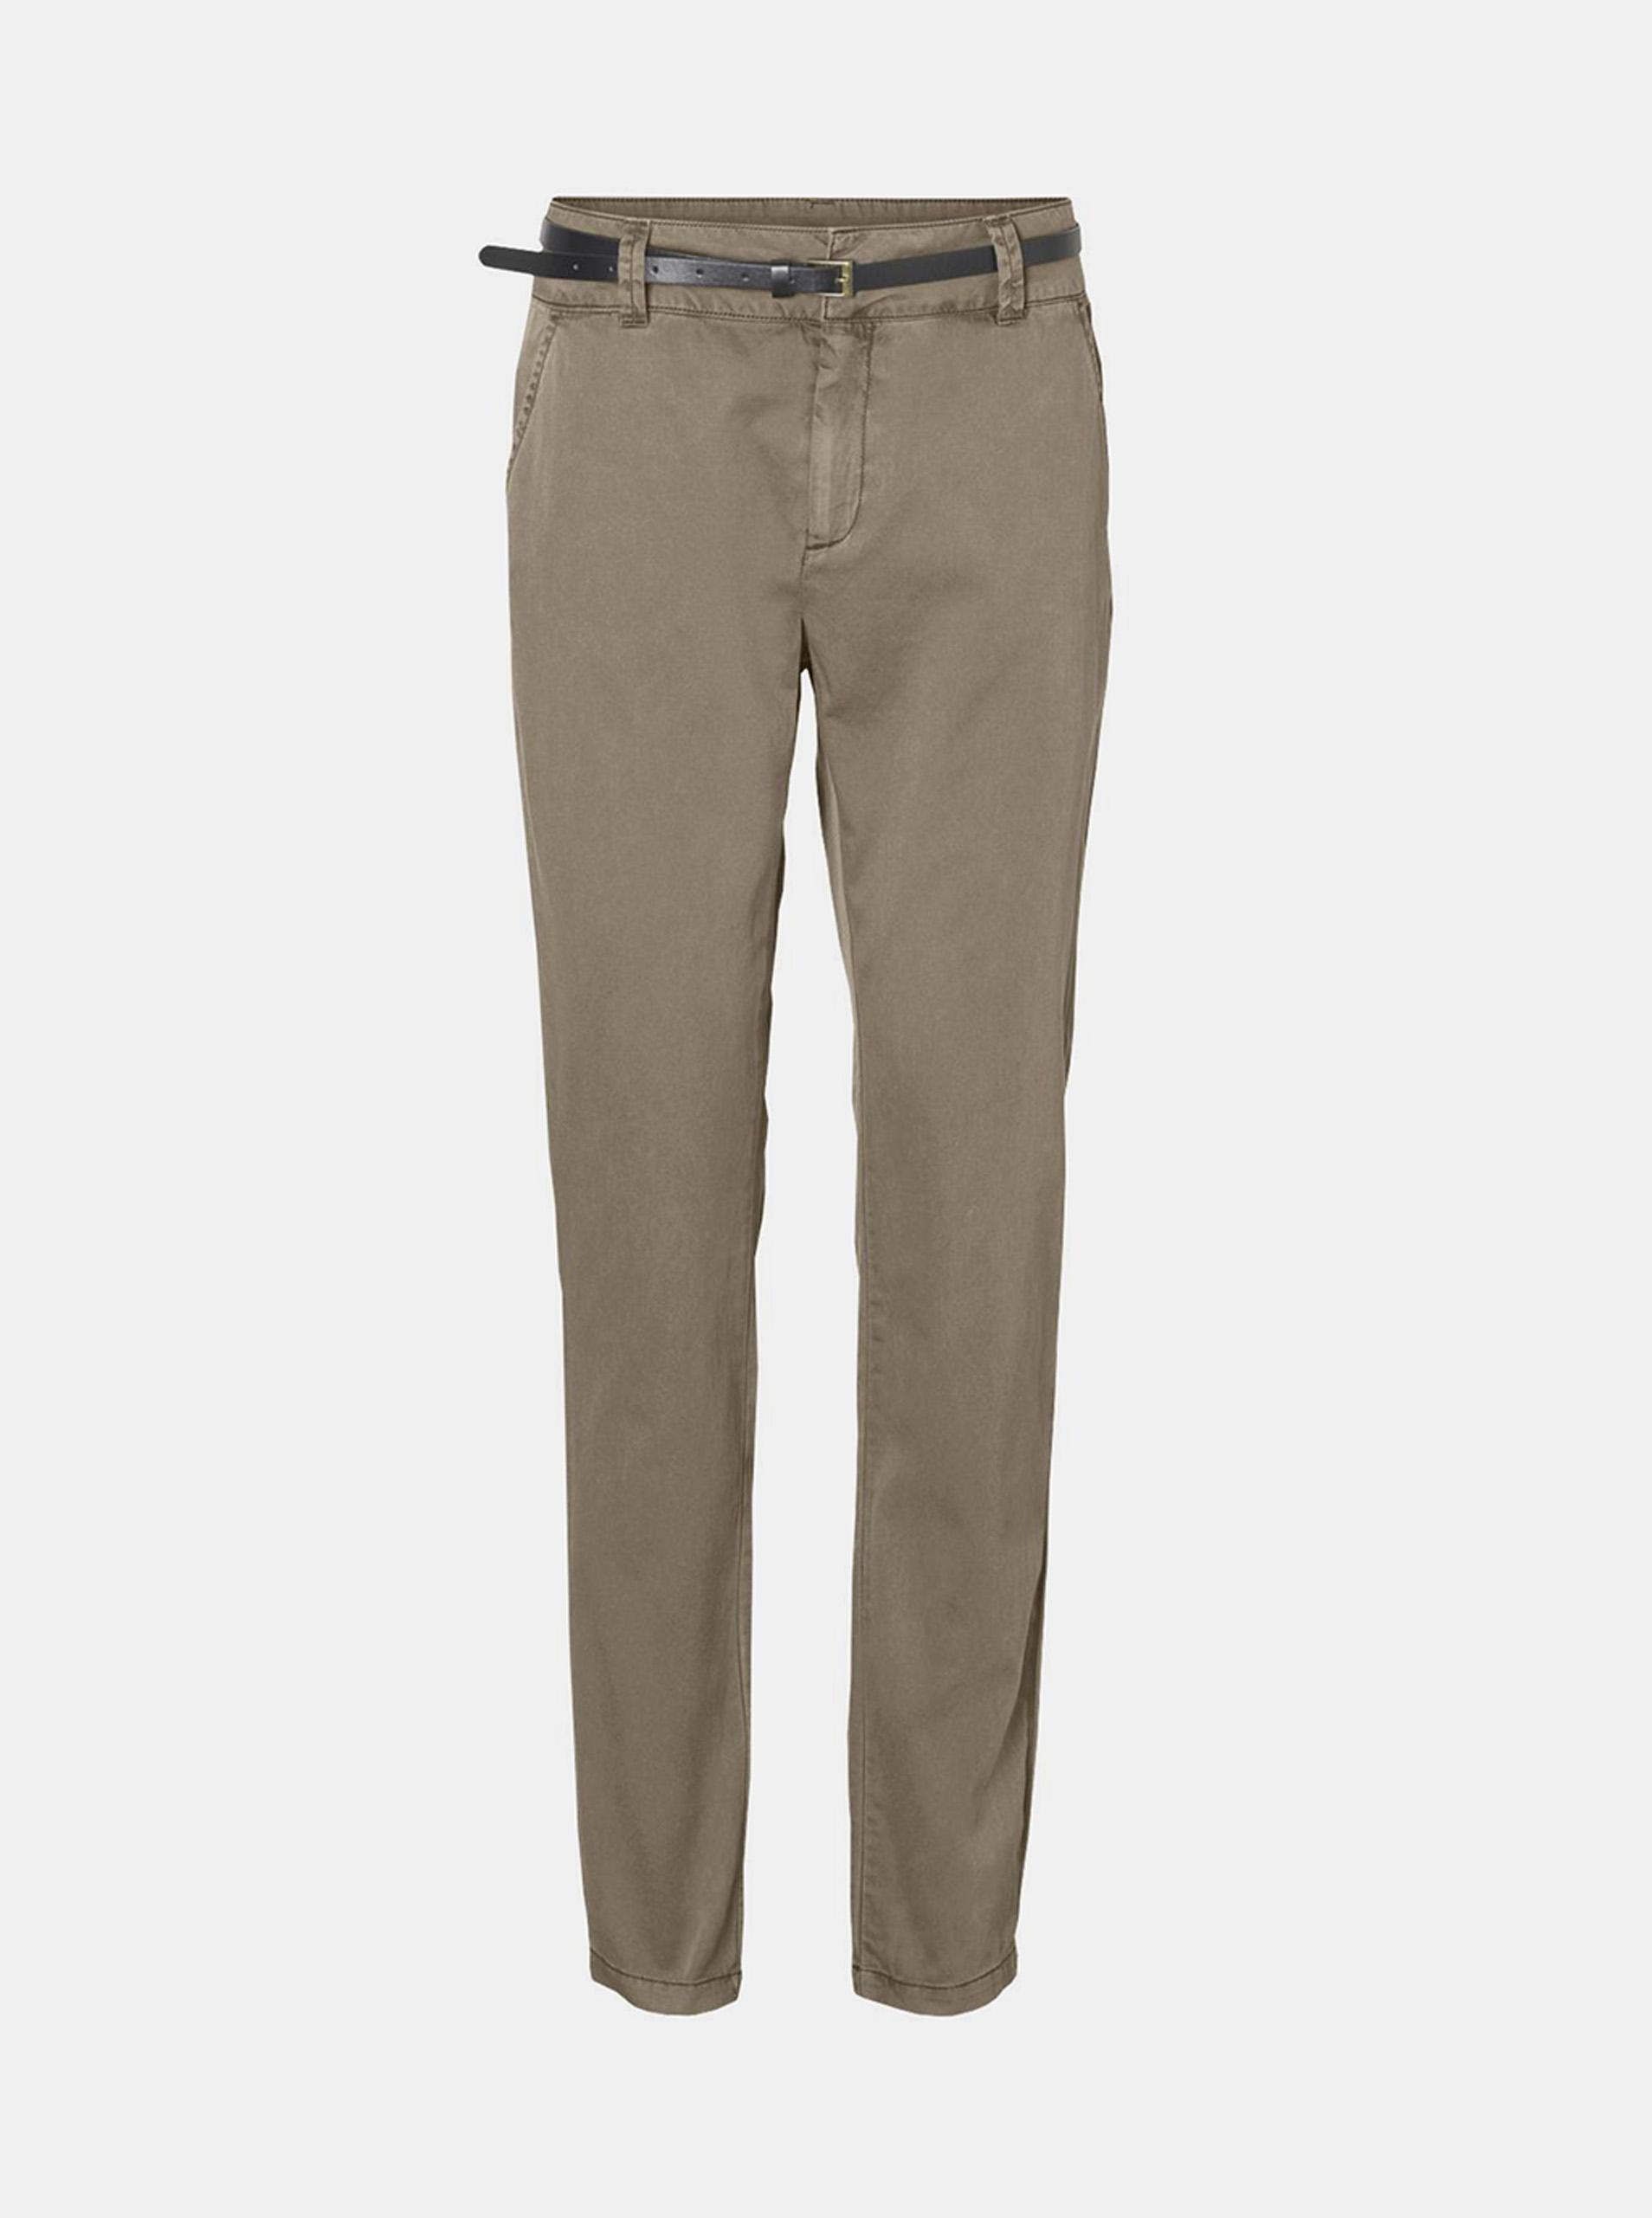 Vero Moda béžové nohavice Flash s opaskom - XS